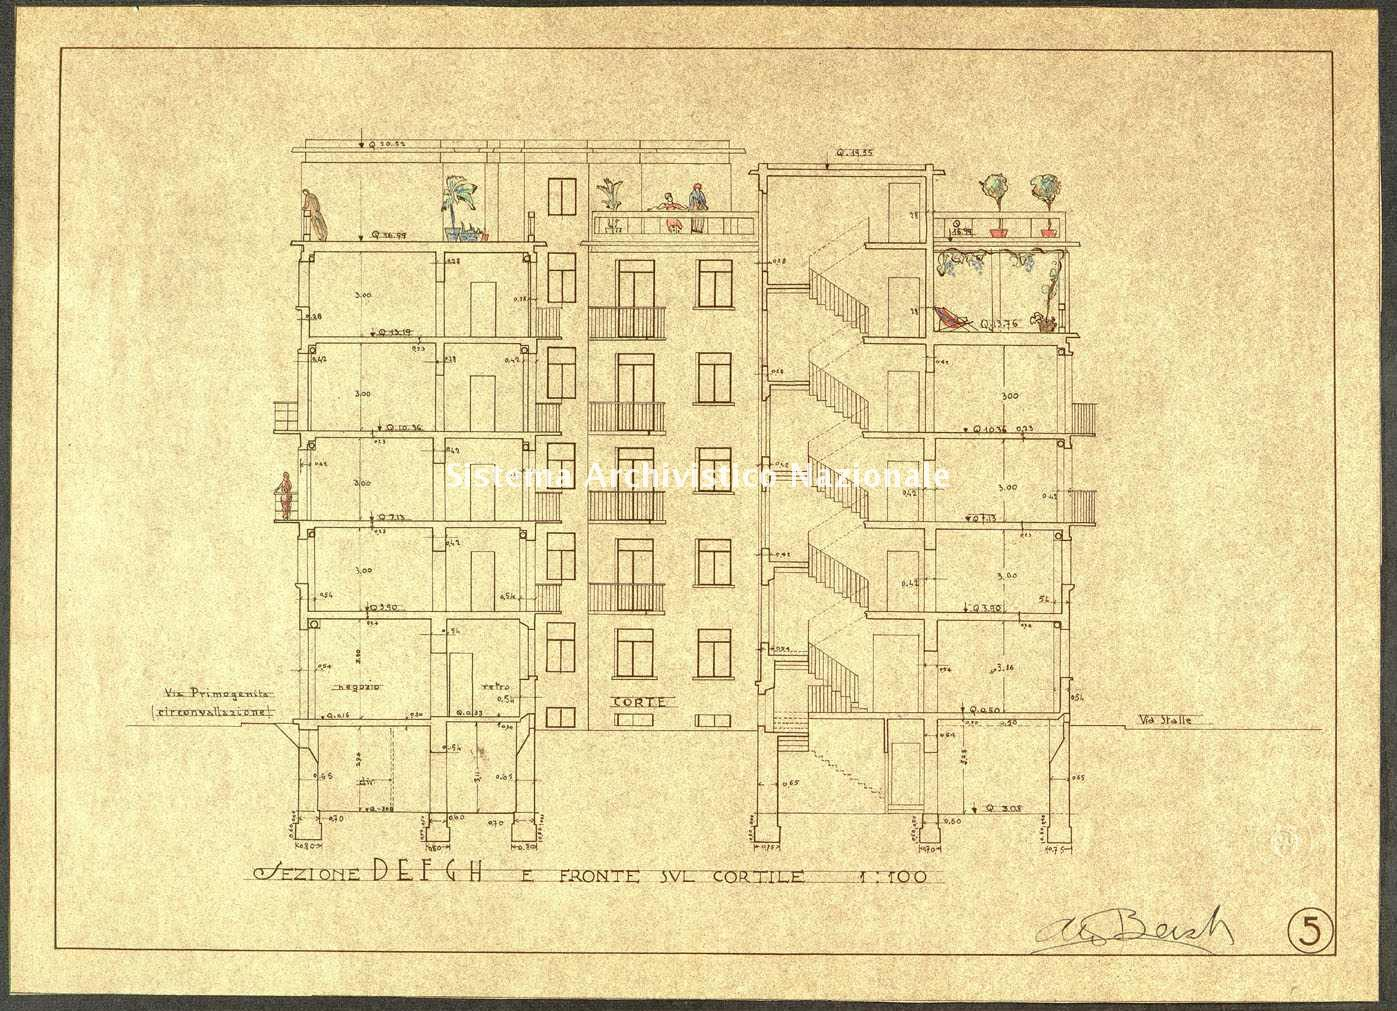 ASPC, Mappe, stampe e disegni, n. 1411